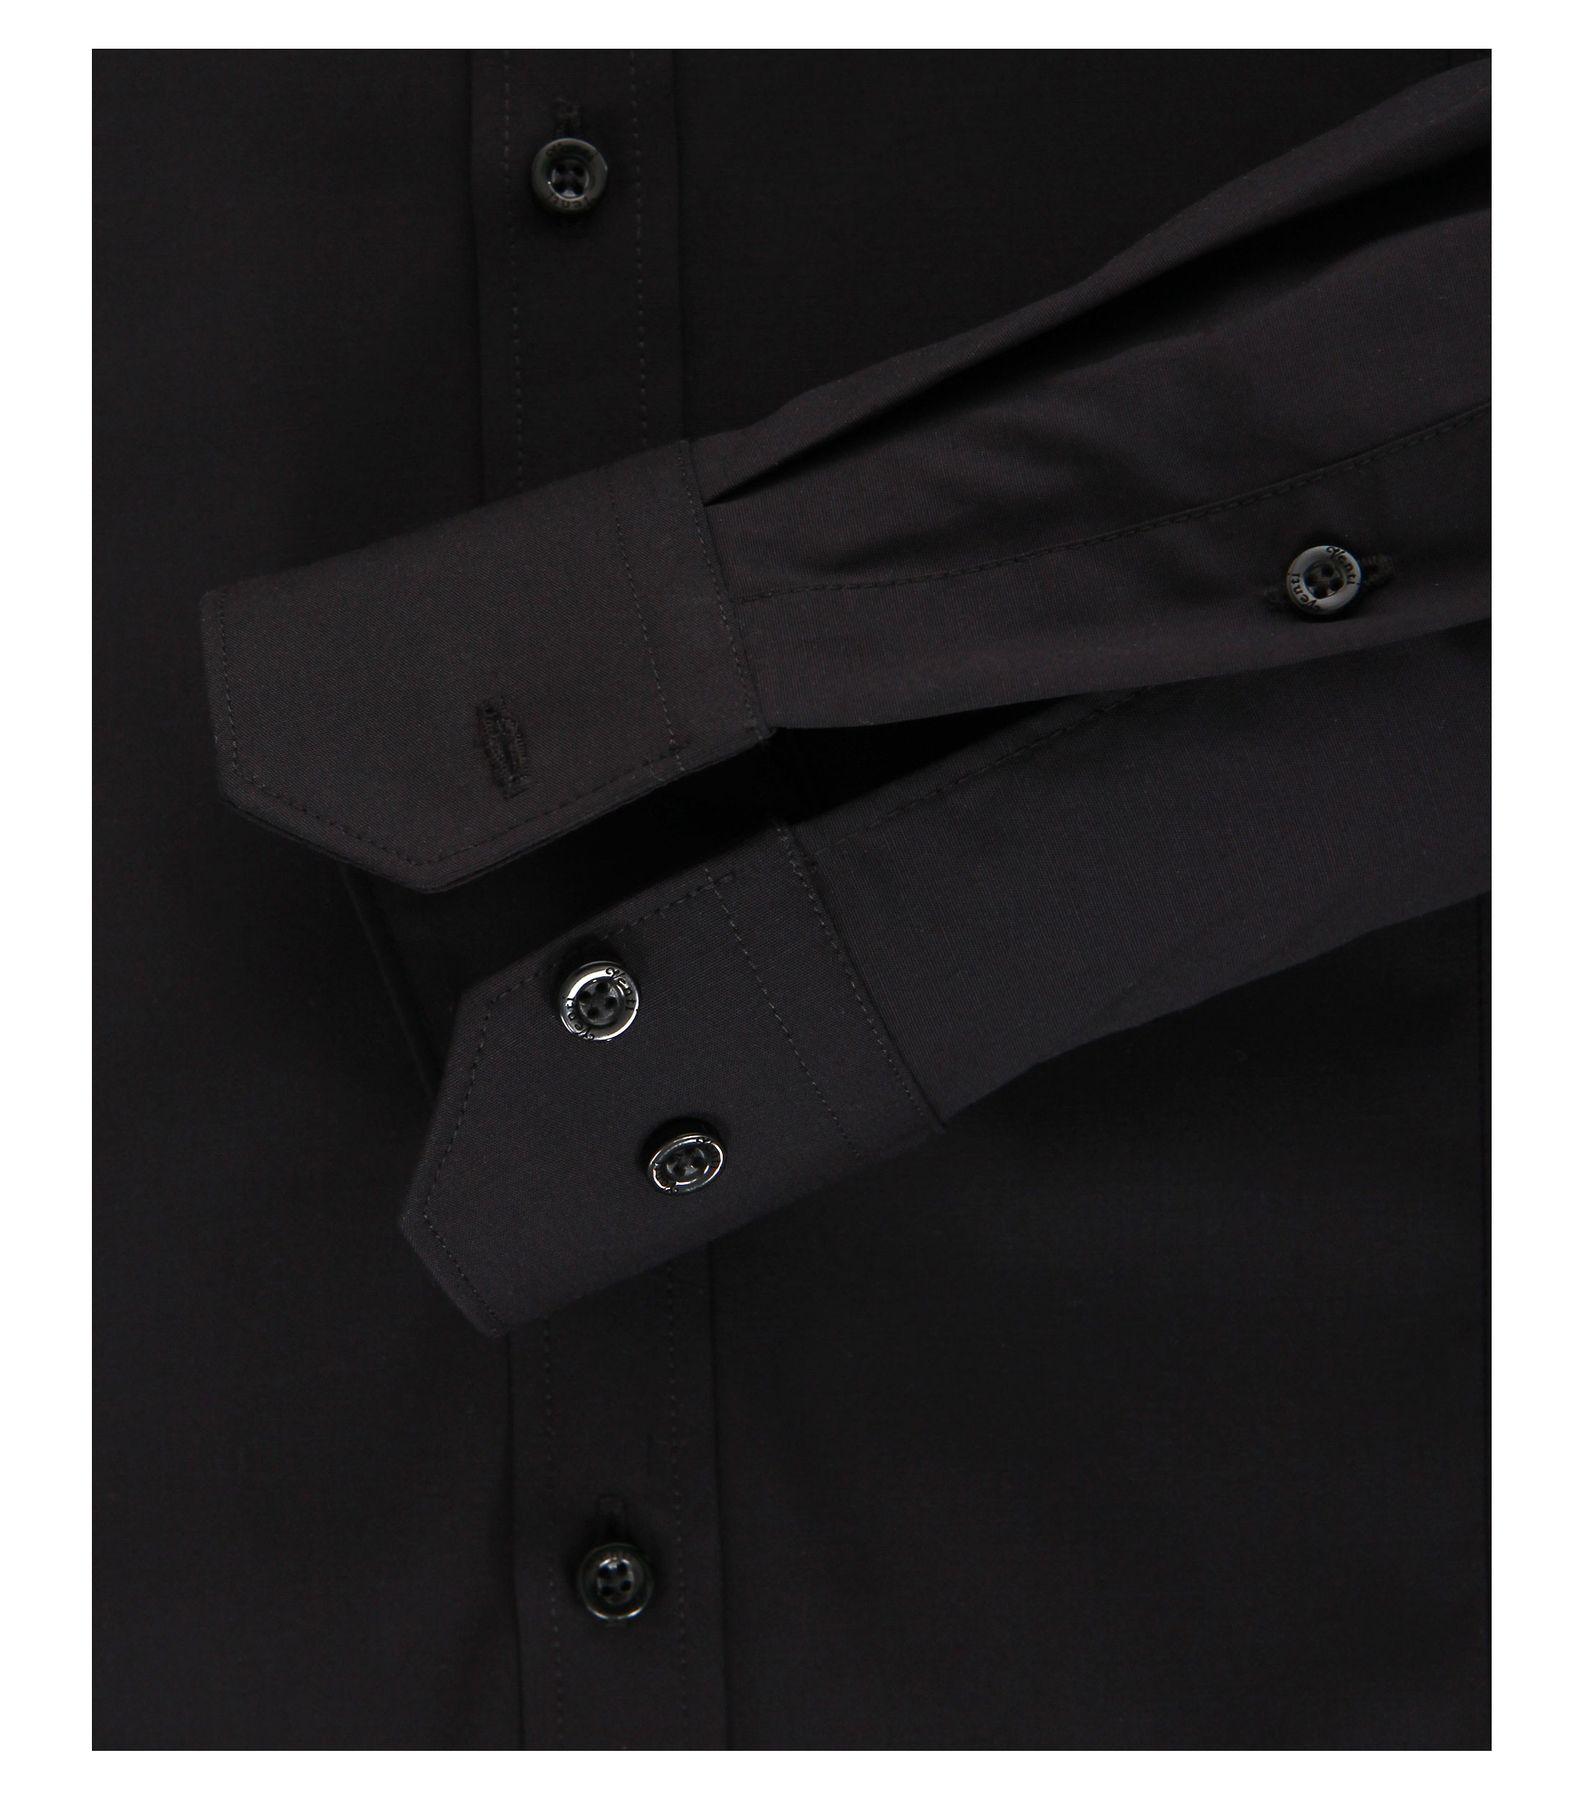 Venti - Body Fit/Super Slim Fit - Bügelfreies Herren Langarm Hemd in diversen Farben (001470) – Bild 16